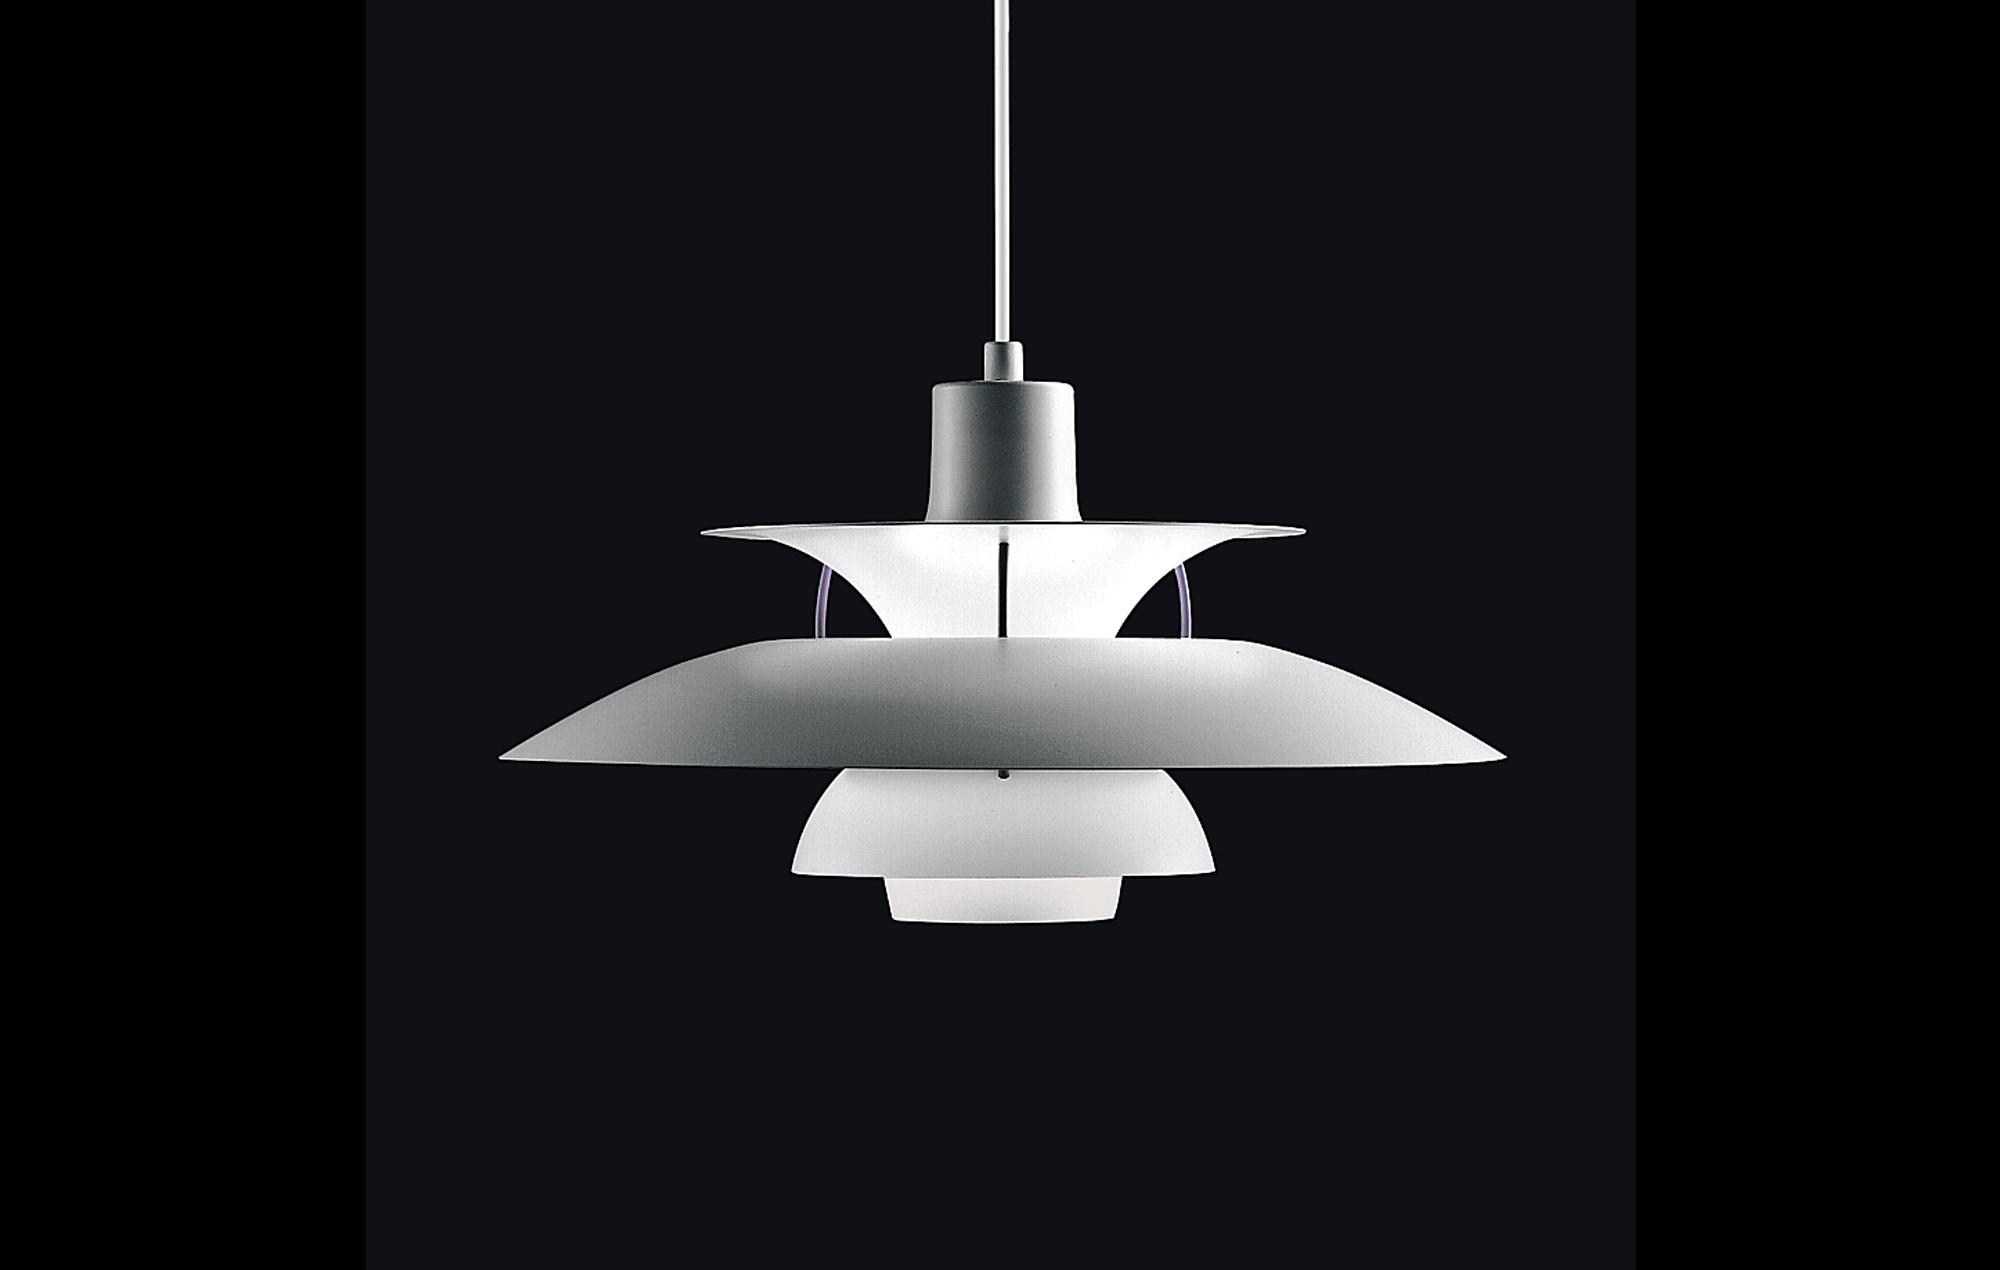 PH-lampen danskernes foretrukne designlampe